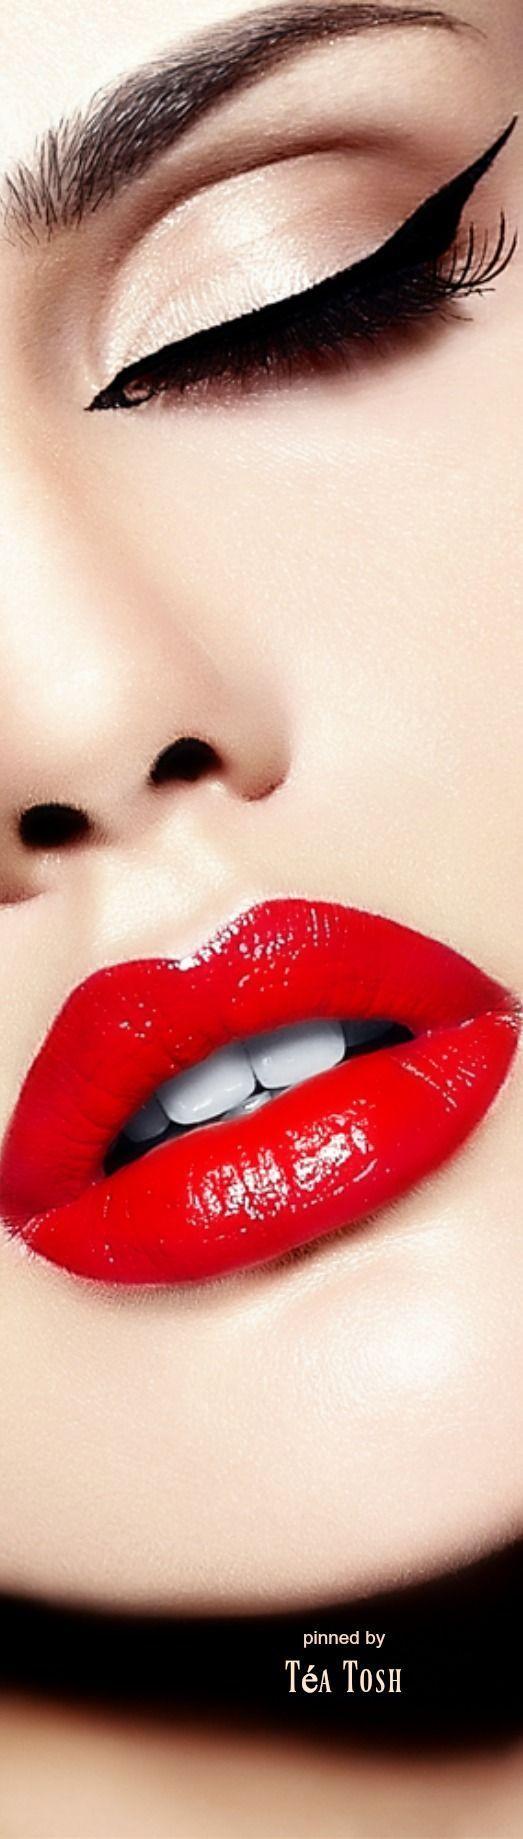 ❇️︎Téa Tosh❇️︎Perfect Red Lips ;)